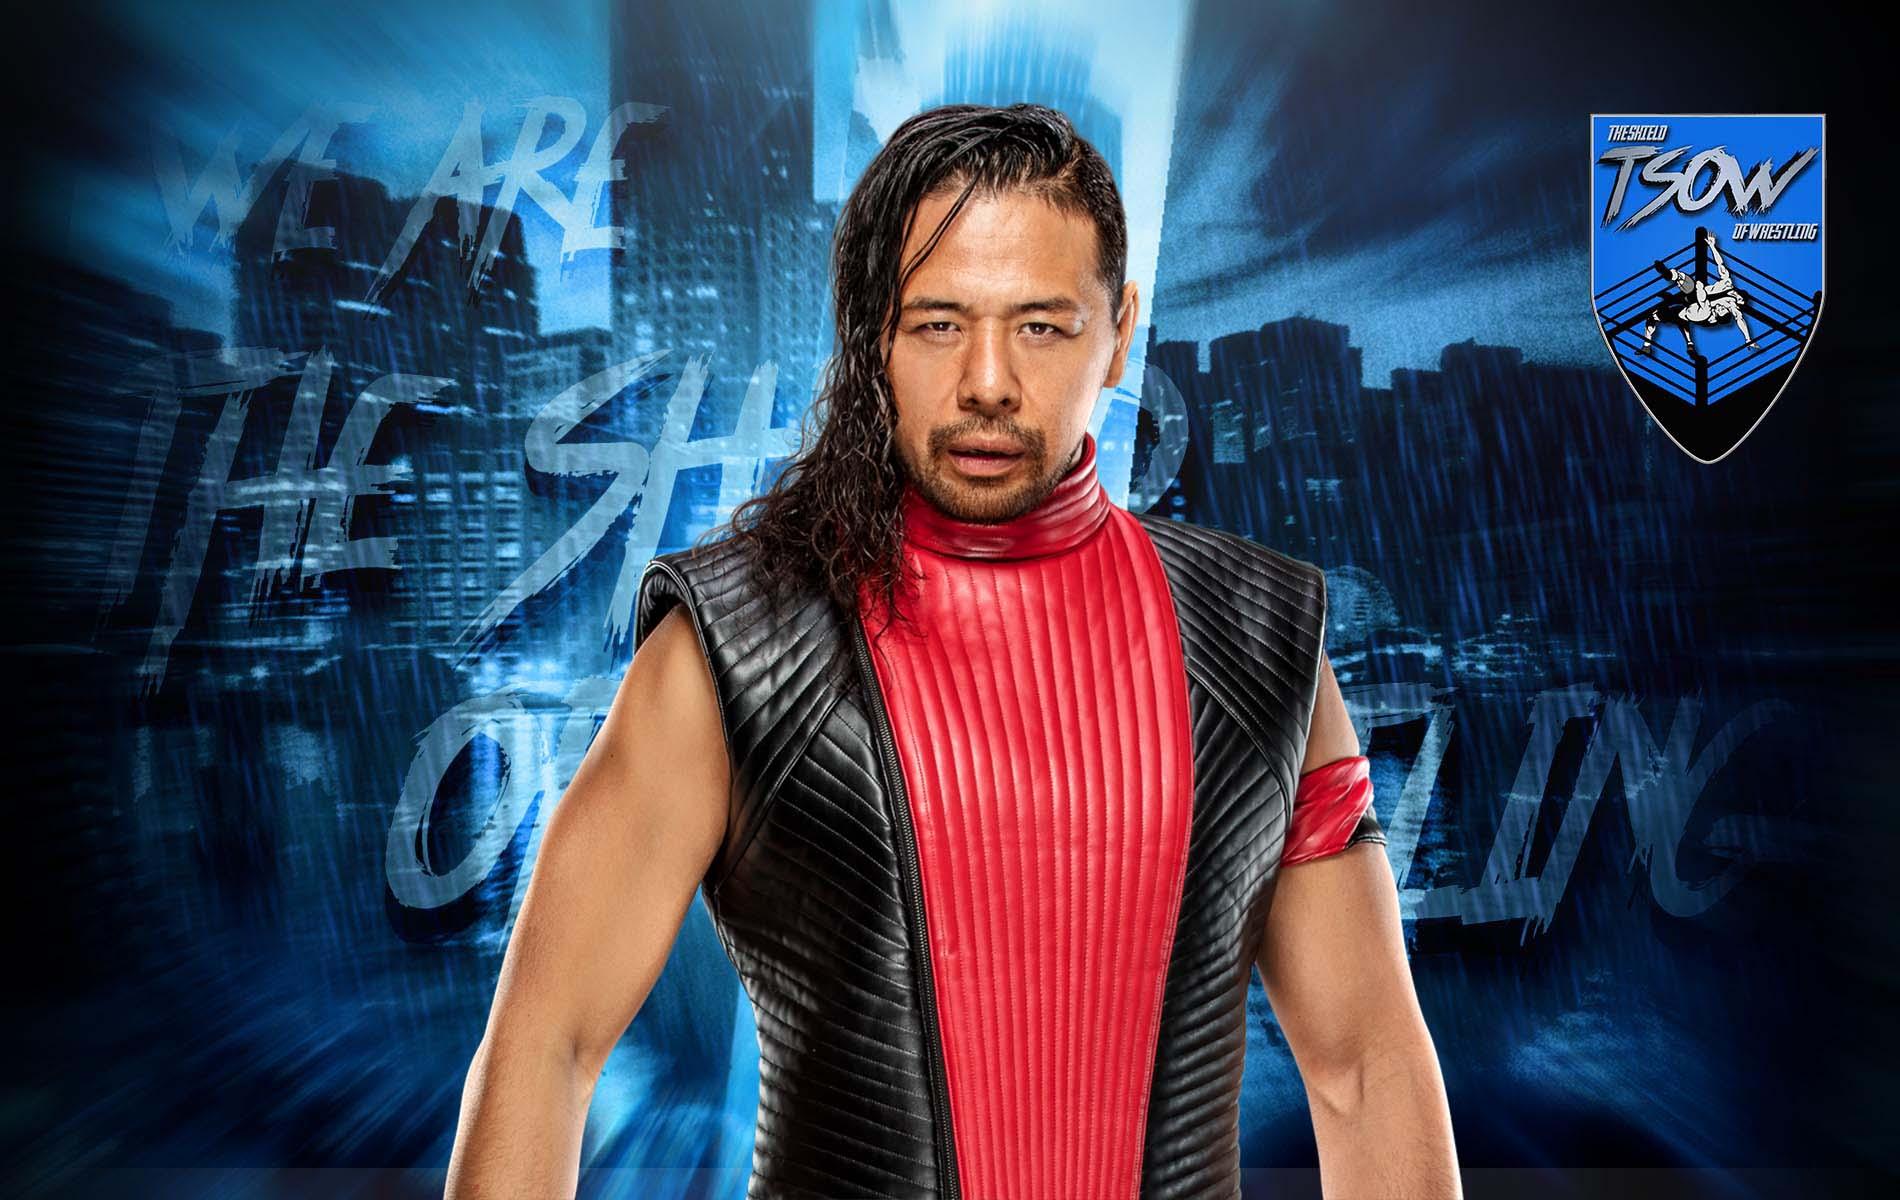 Shinsuke Nakamura vuole affrontare Brock Lesnar